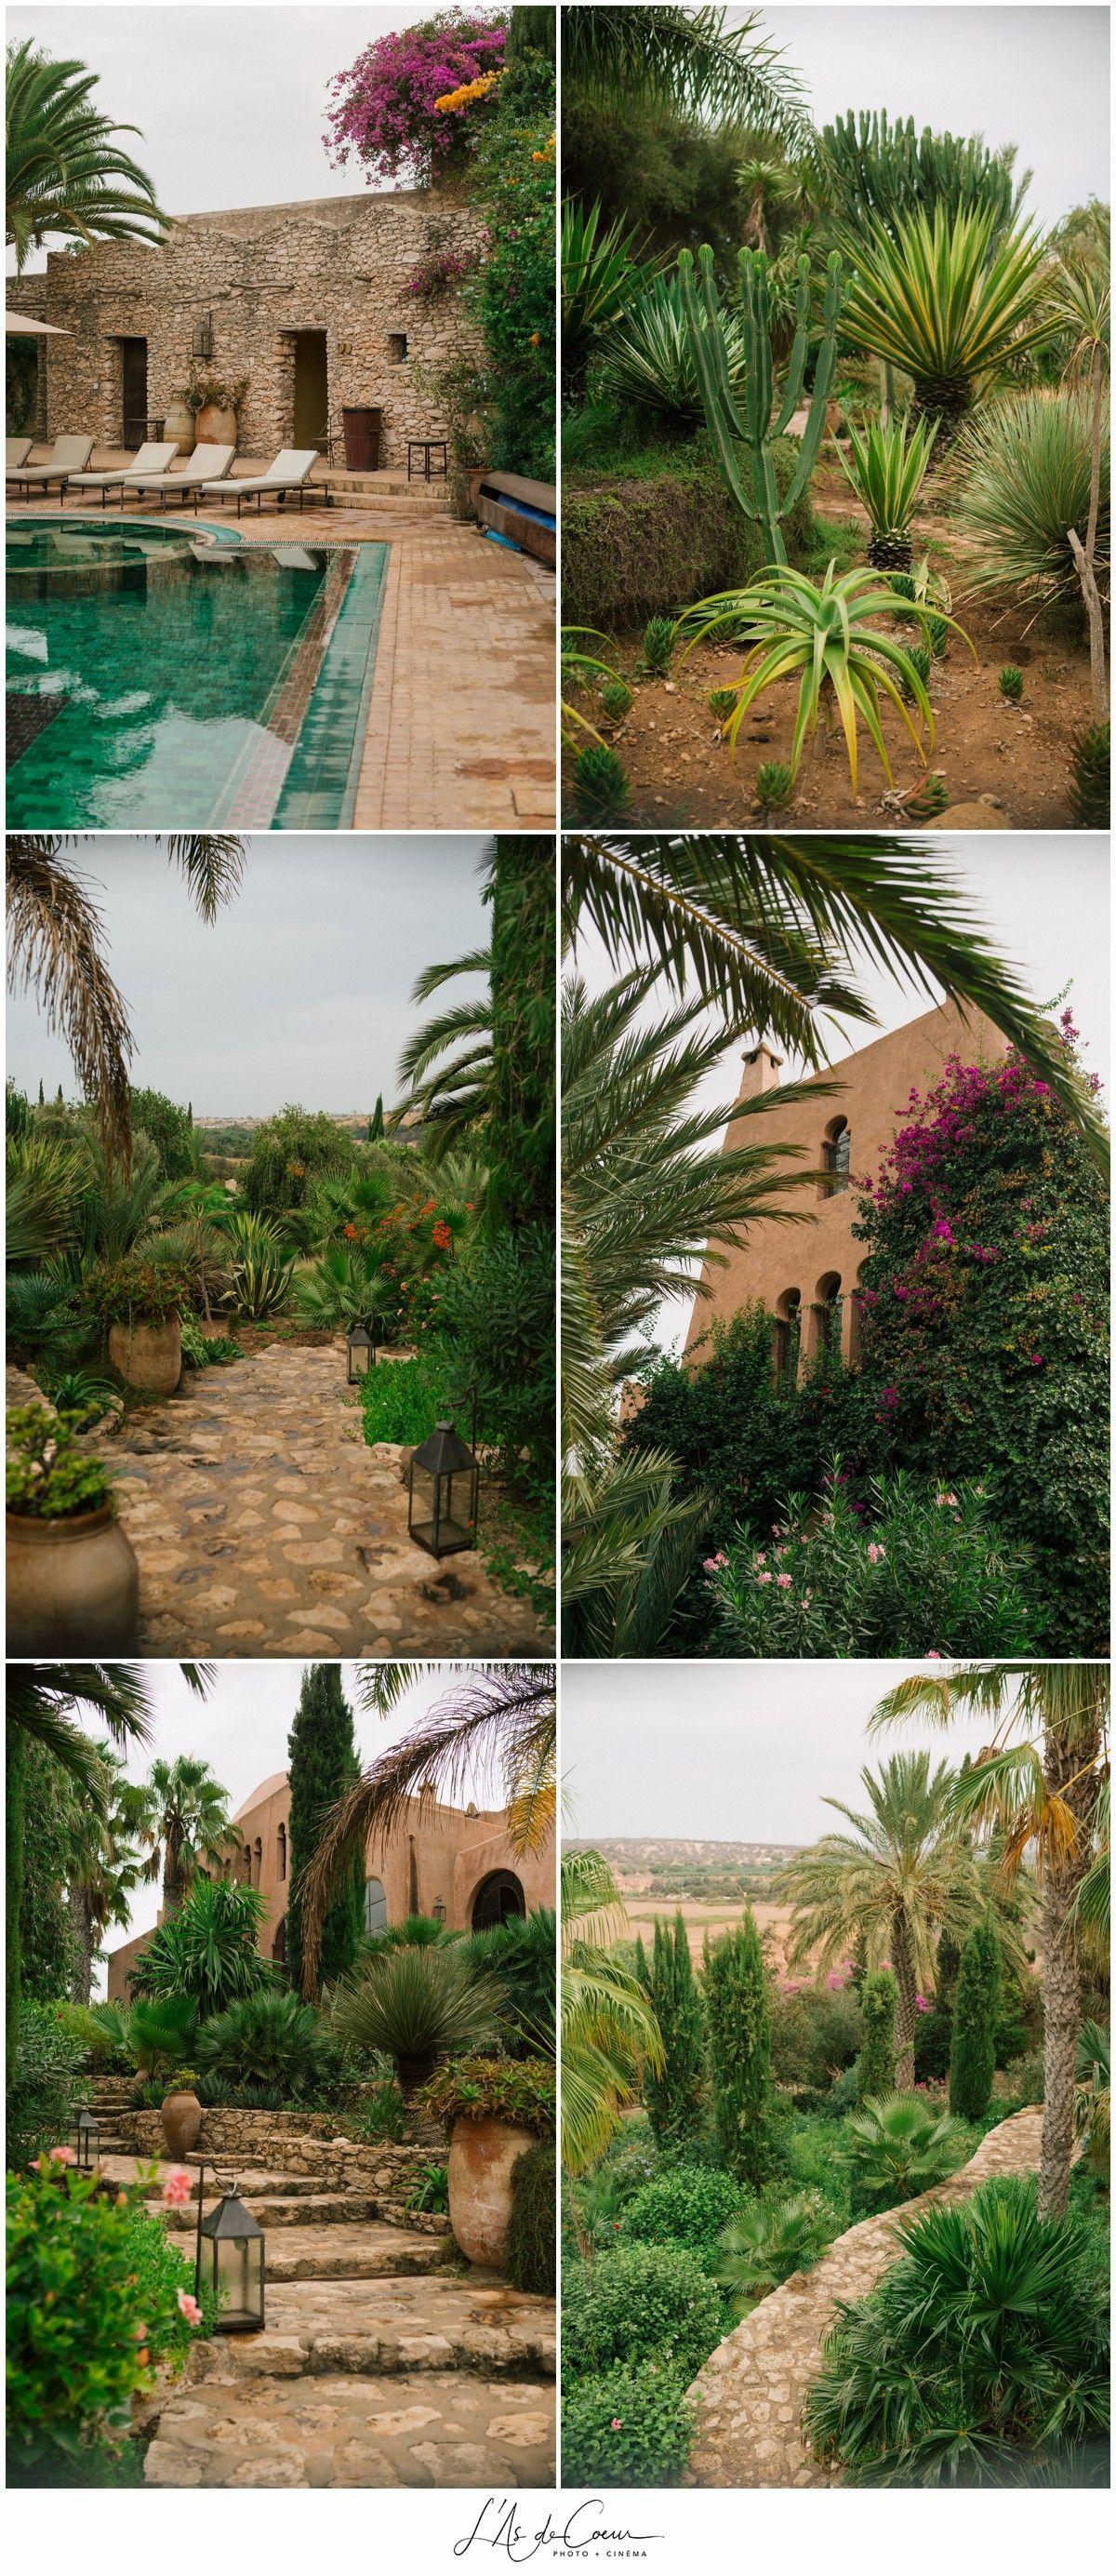 Photographe Mariage Essaouira Le Jardin Des Douars Maroc